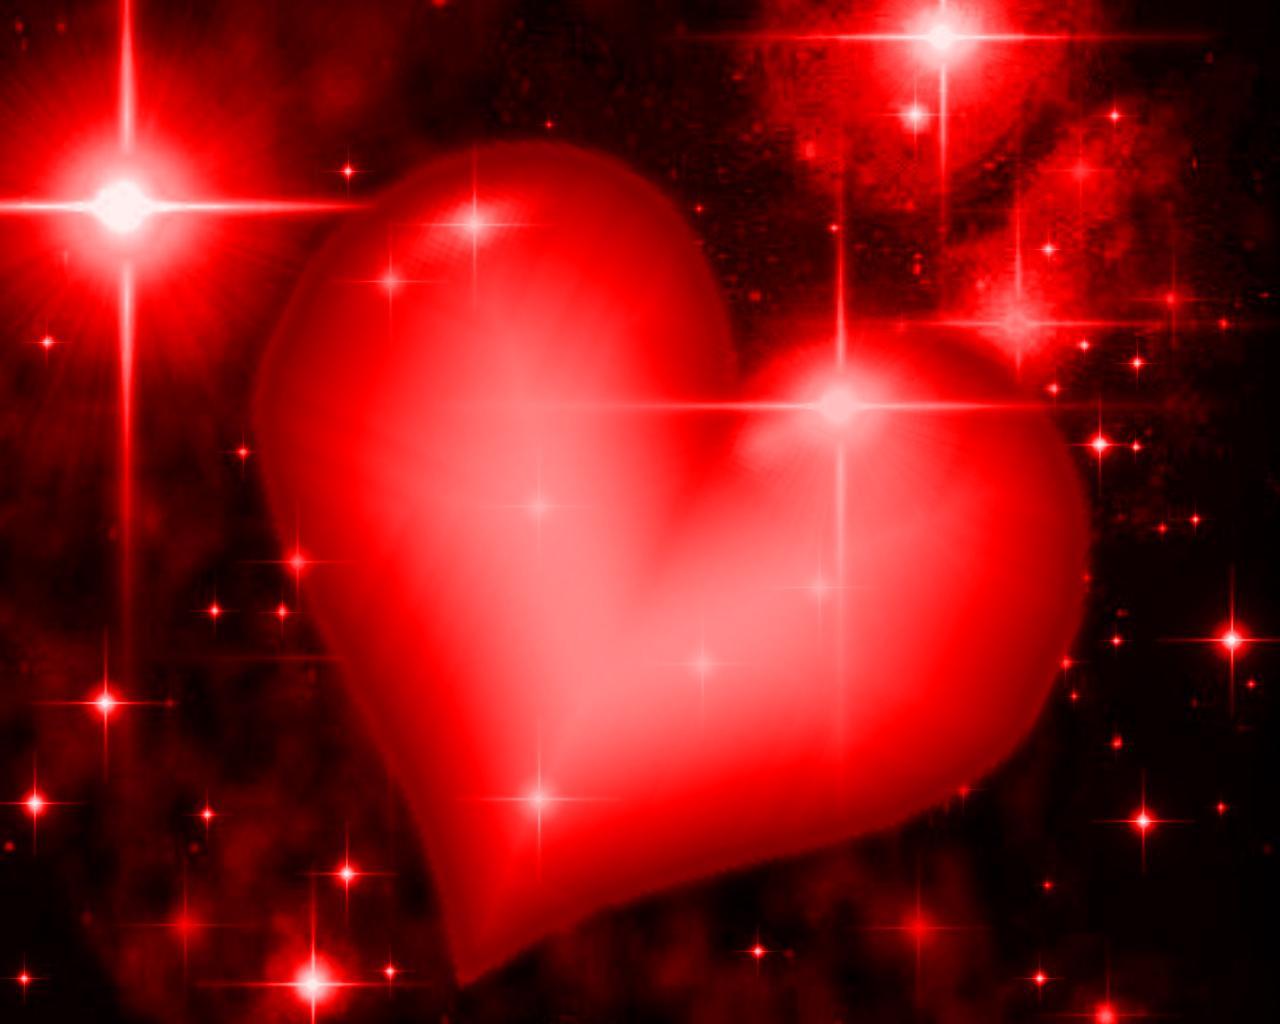 Love Blood Heart Wallpaper : Wallpaper Hearts Love - WallpaperSafari